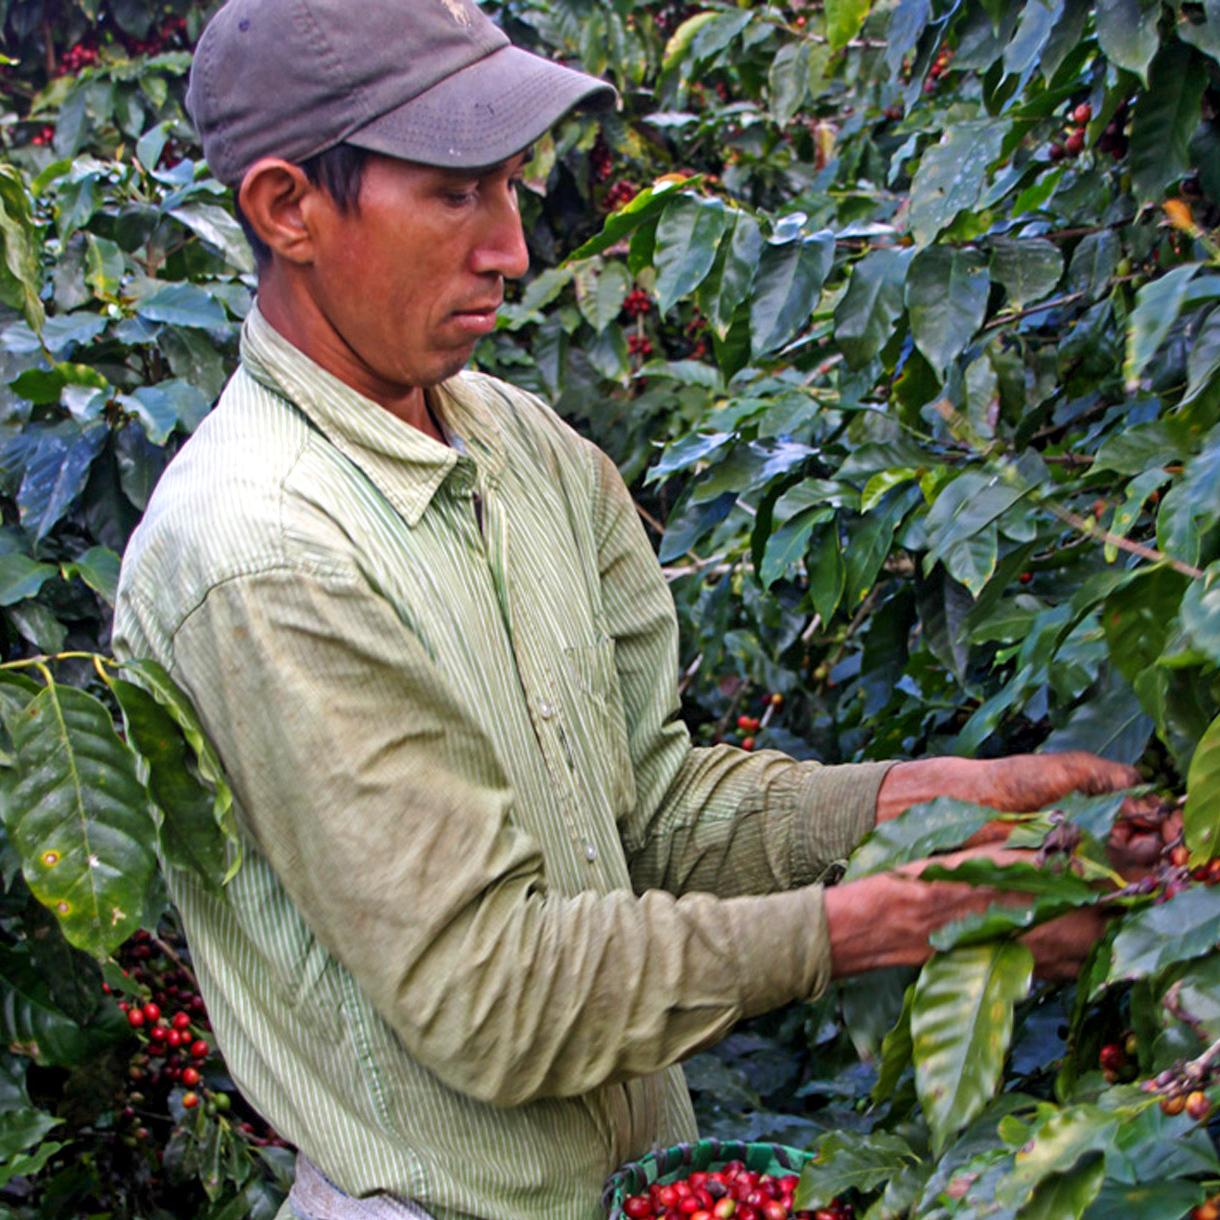 harvesting honduran coffee for southern pecan coffee beans